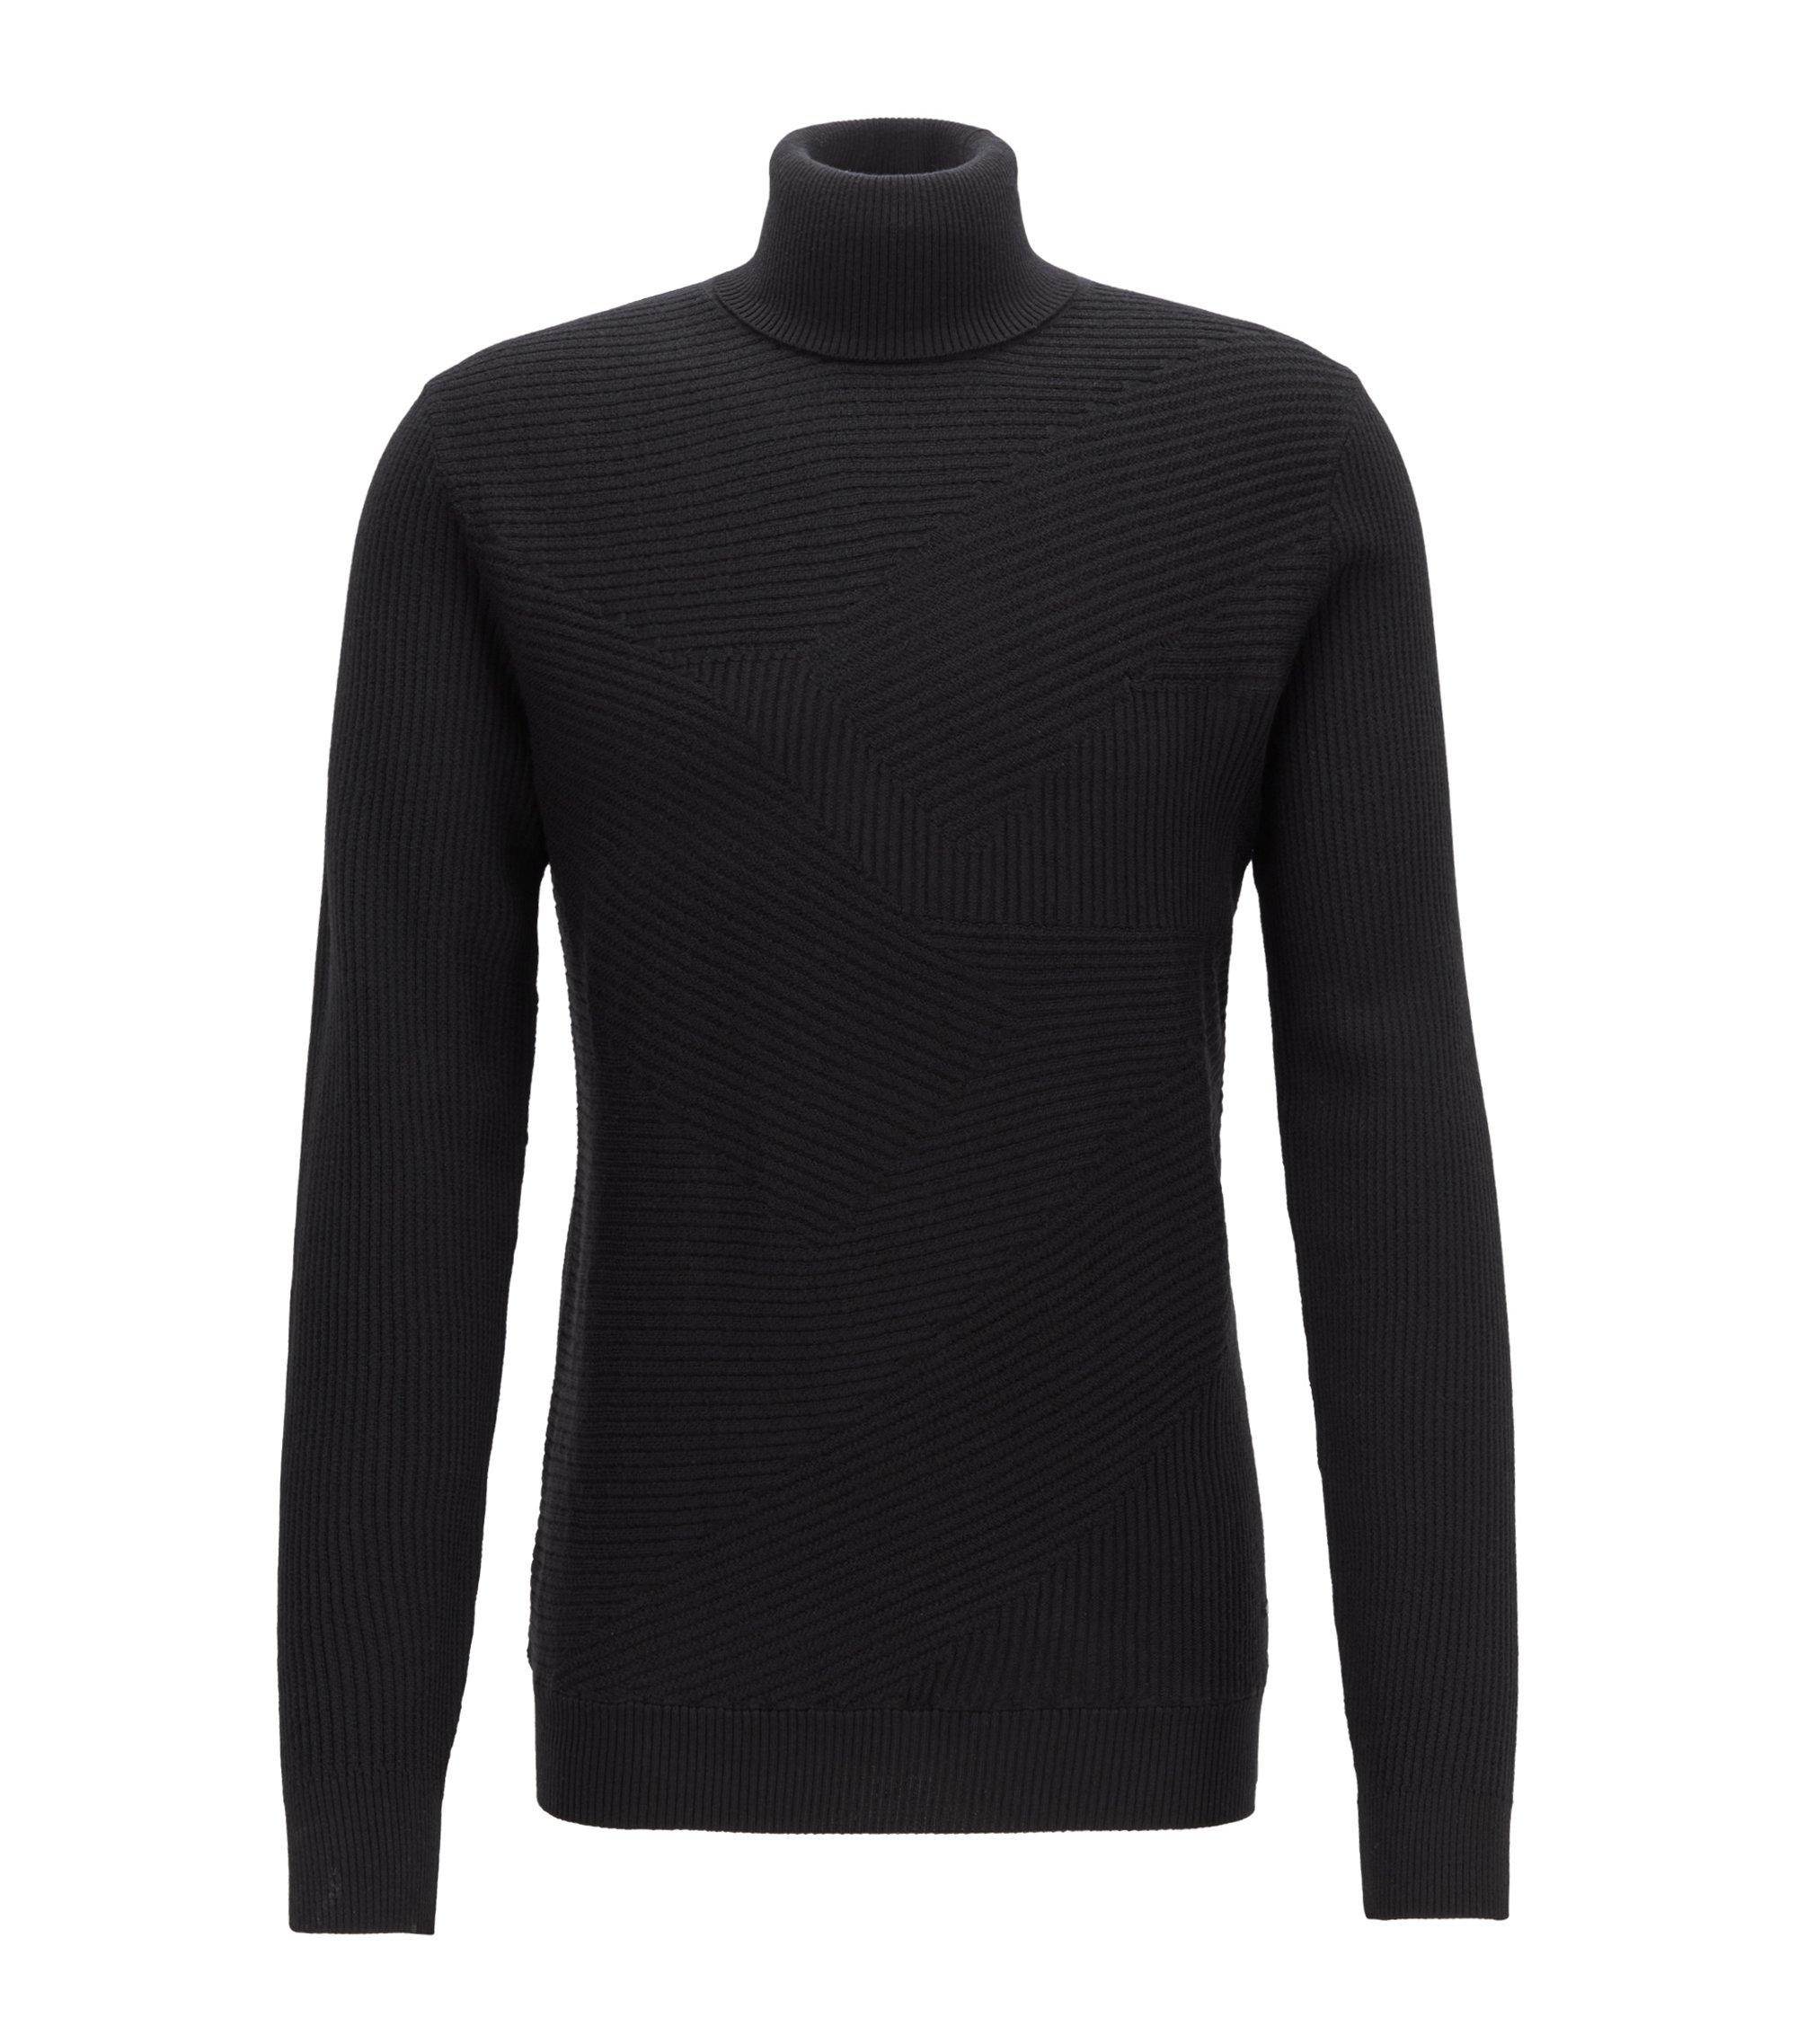 Turtleneck sweater in Italian merino wool with rib patterns, Black